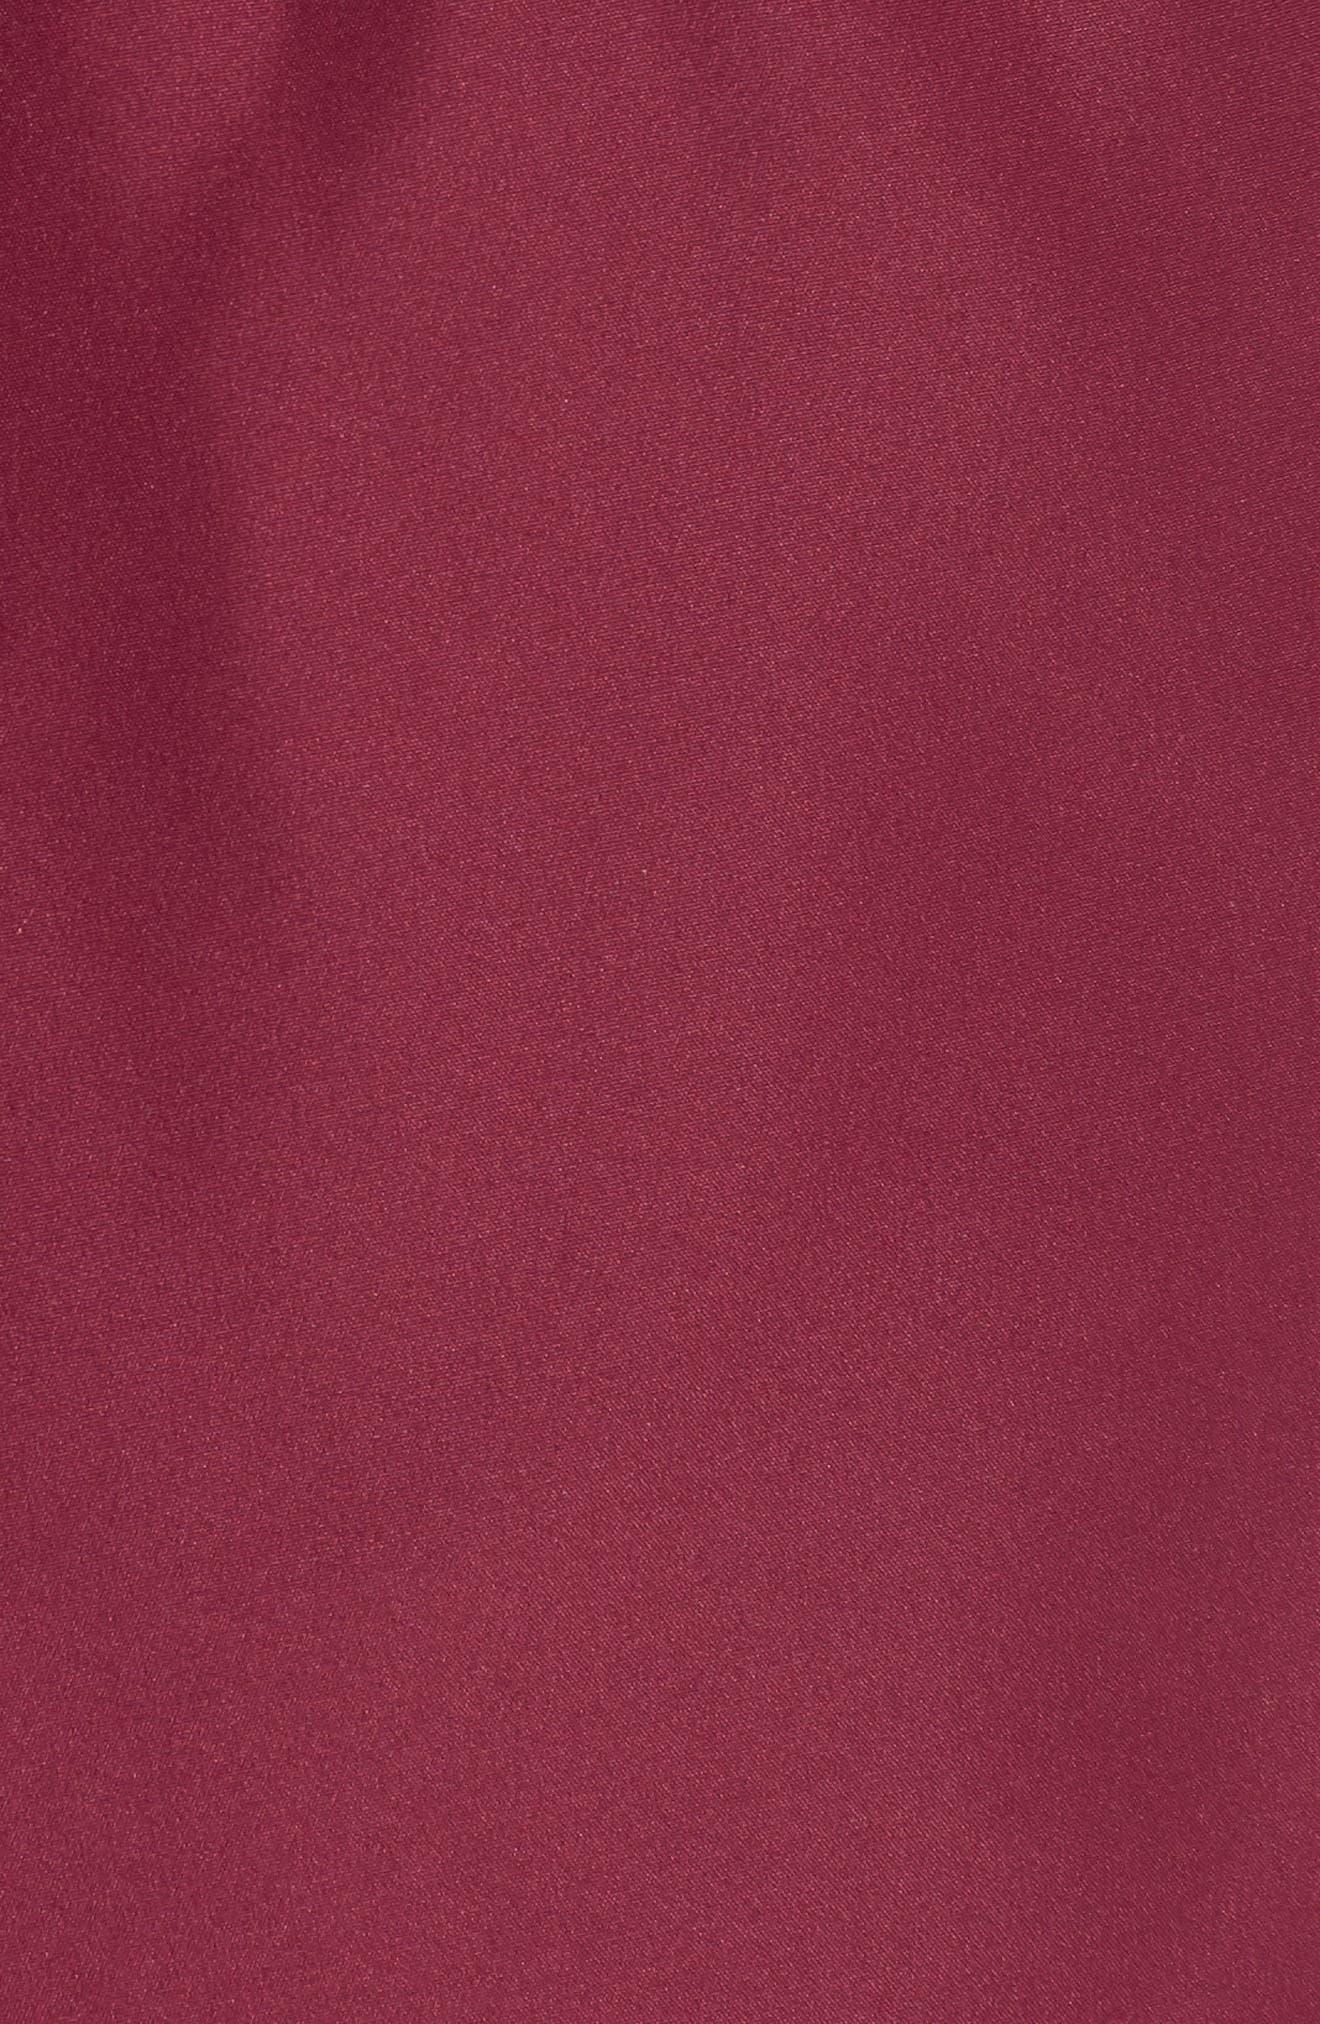 Programme Shorts,                             Alternate thumbnail 6, color,                             500